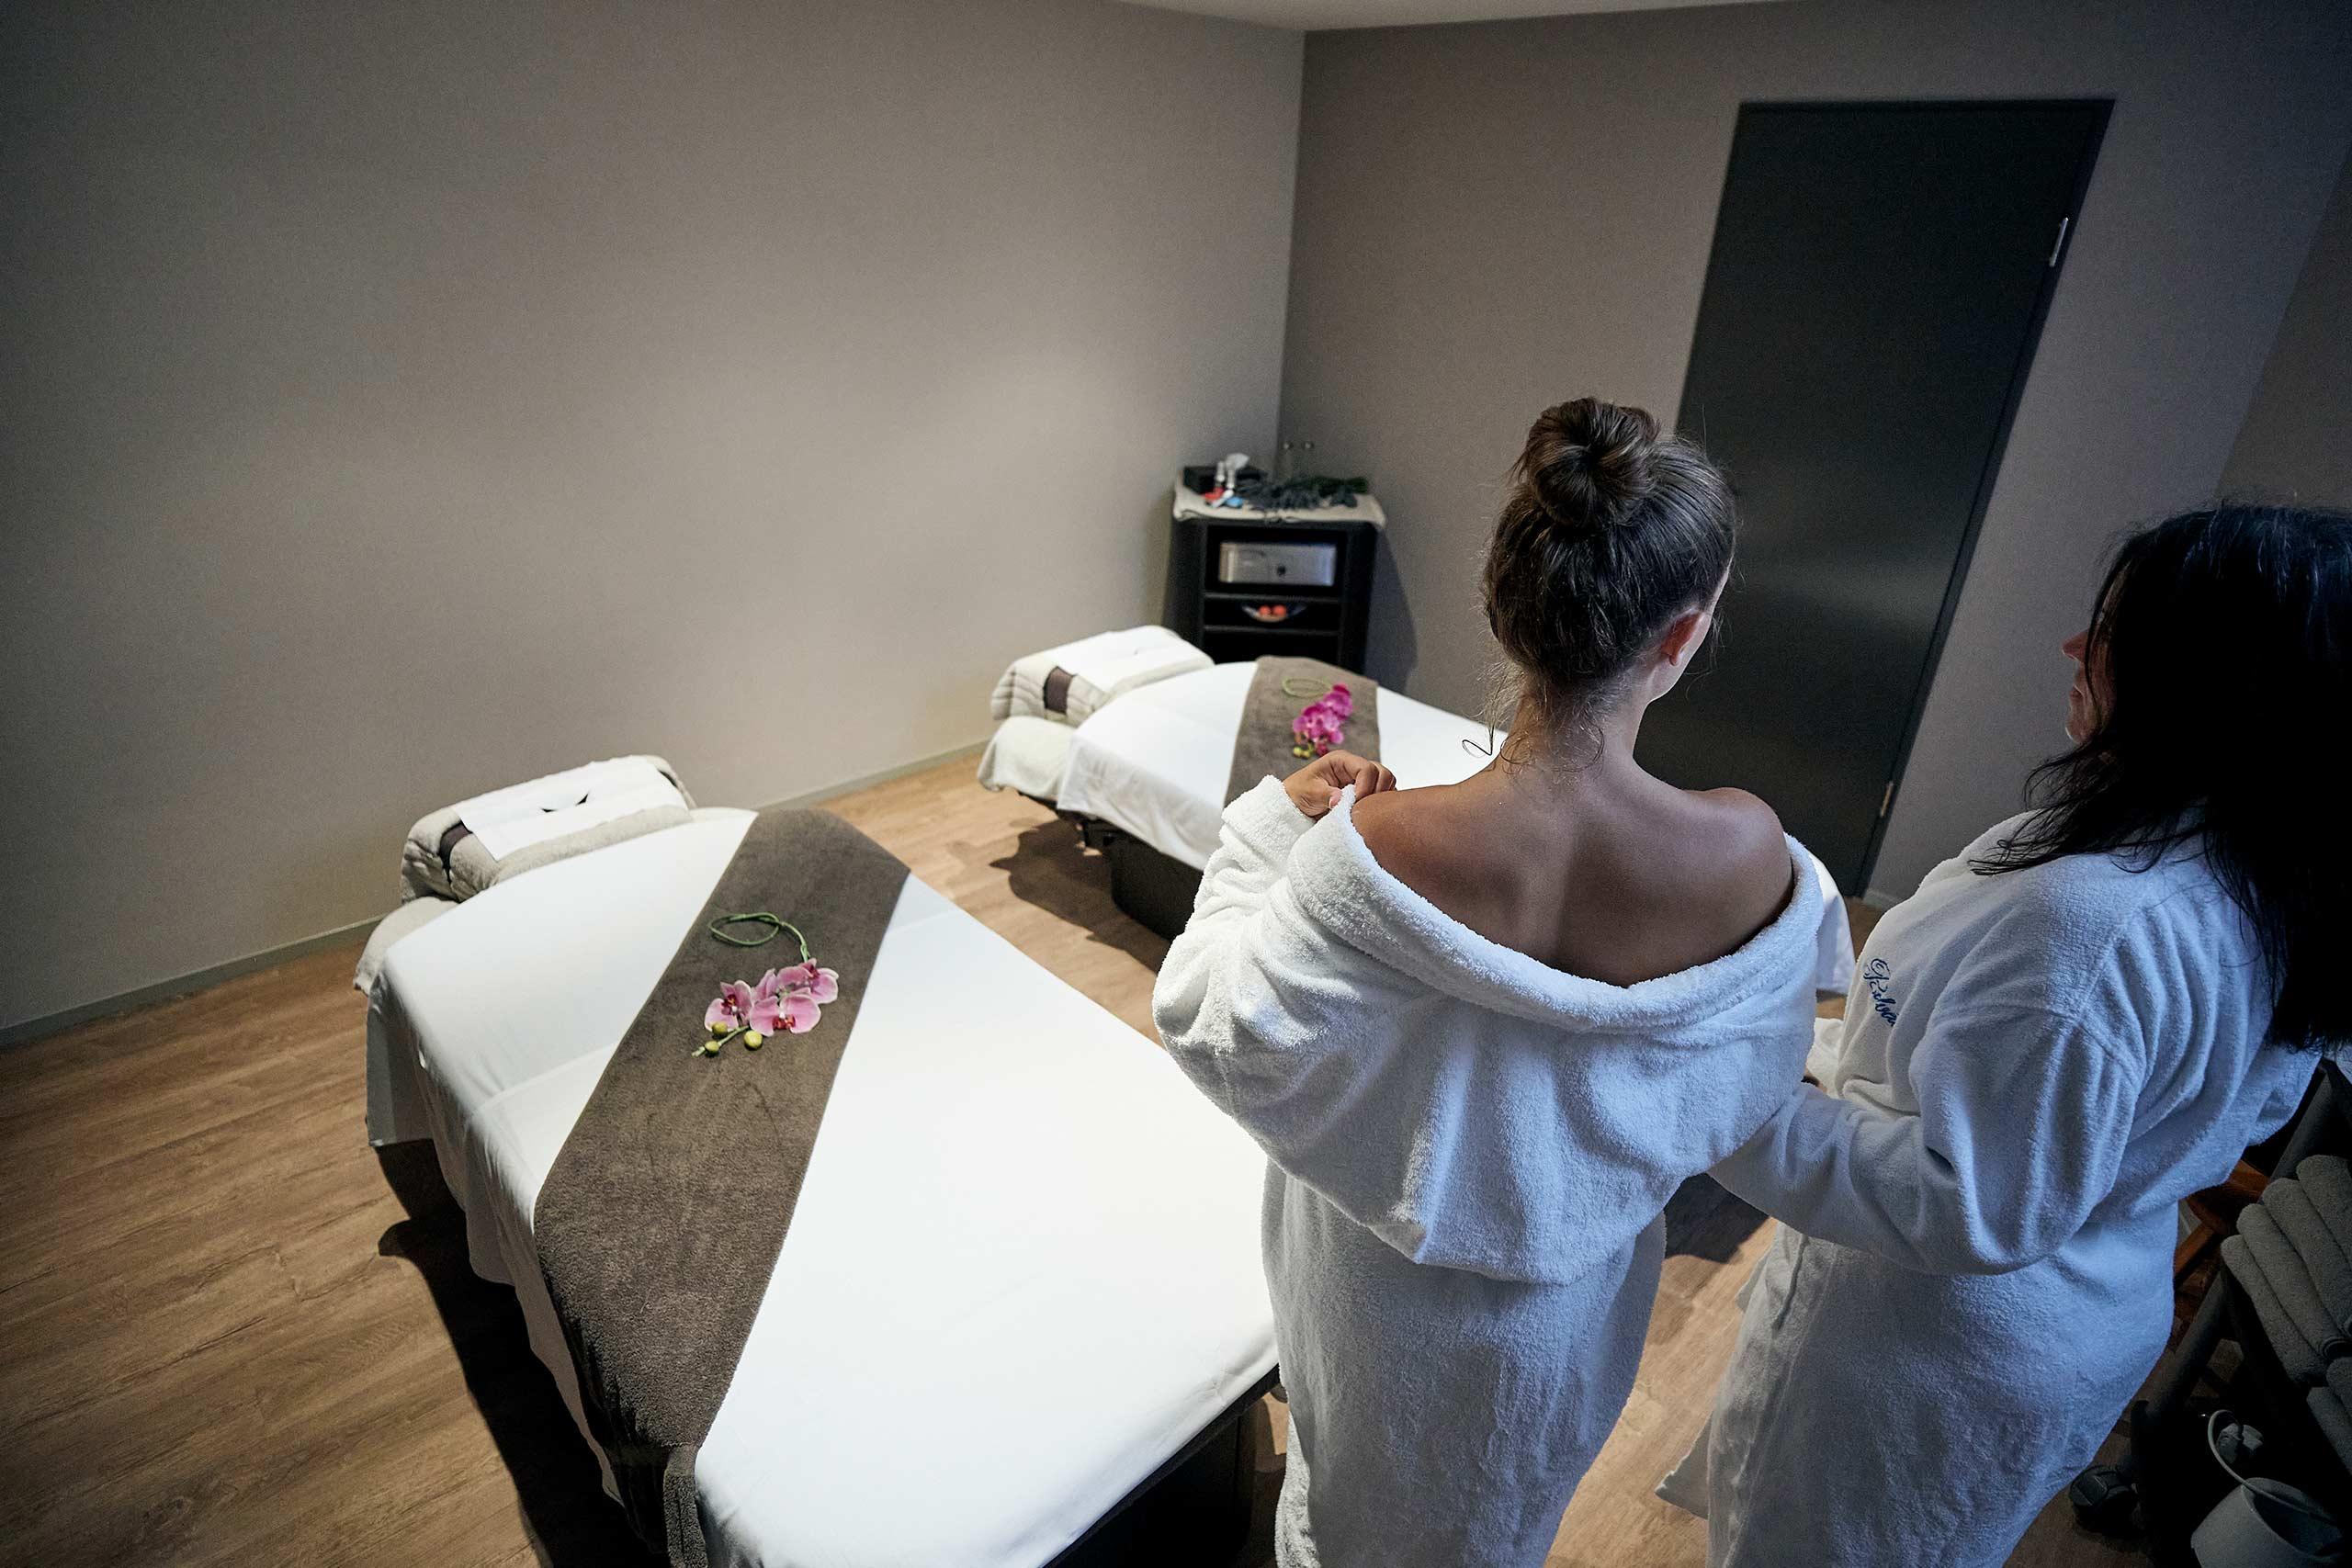 spiez-belvedere-wellness-oase-massageraum.jpg